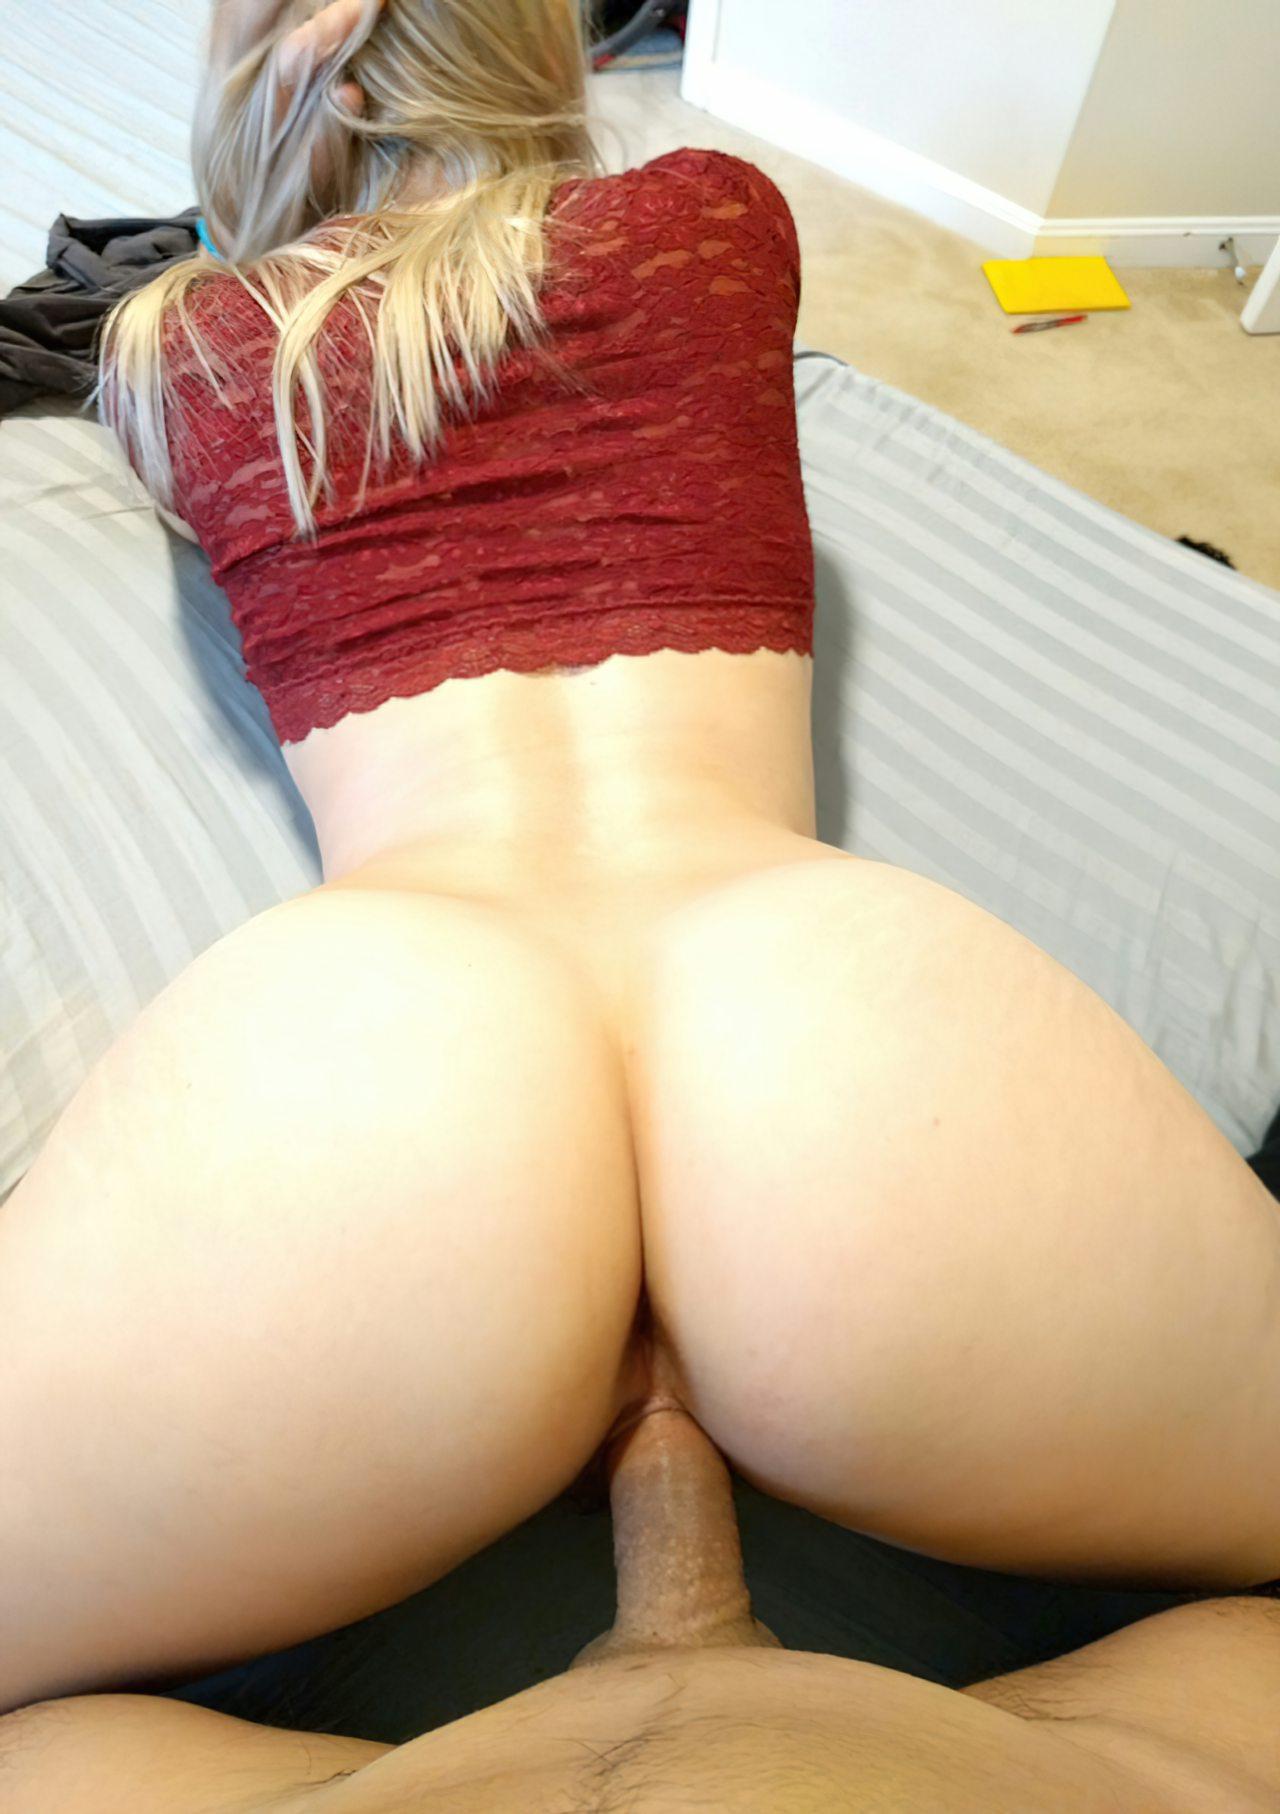 Fotos Sexo Nudes Loira Anonima (16)